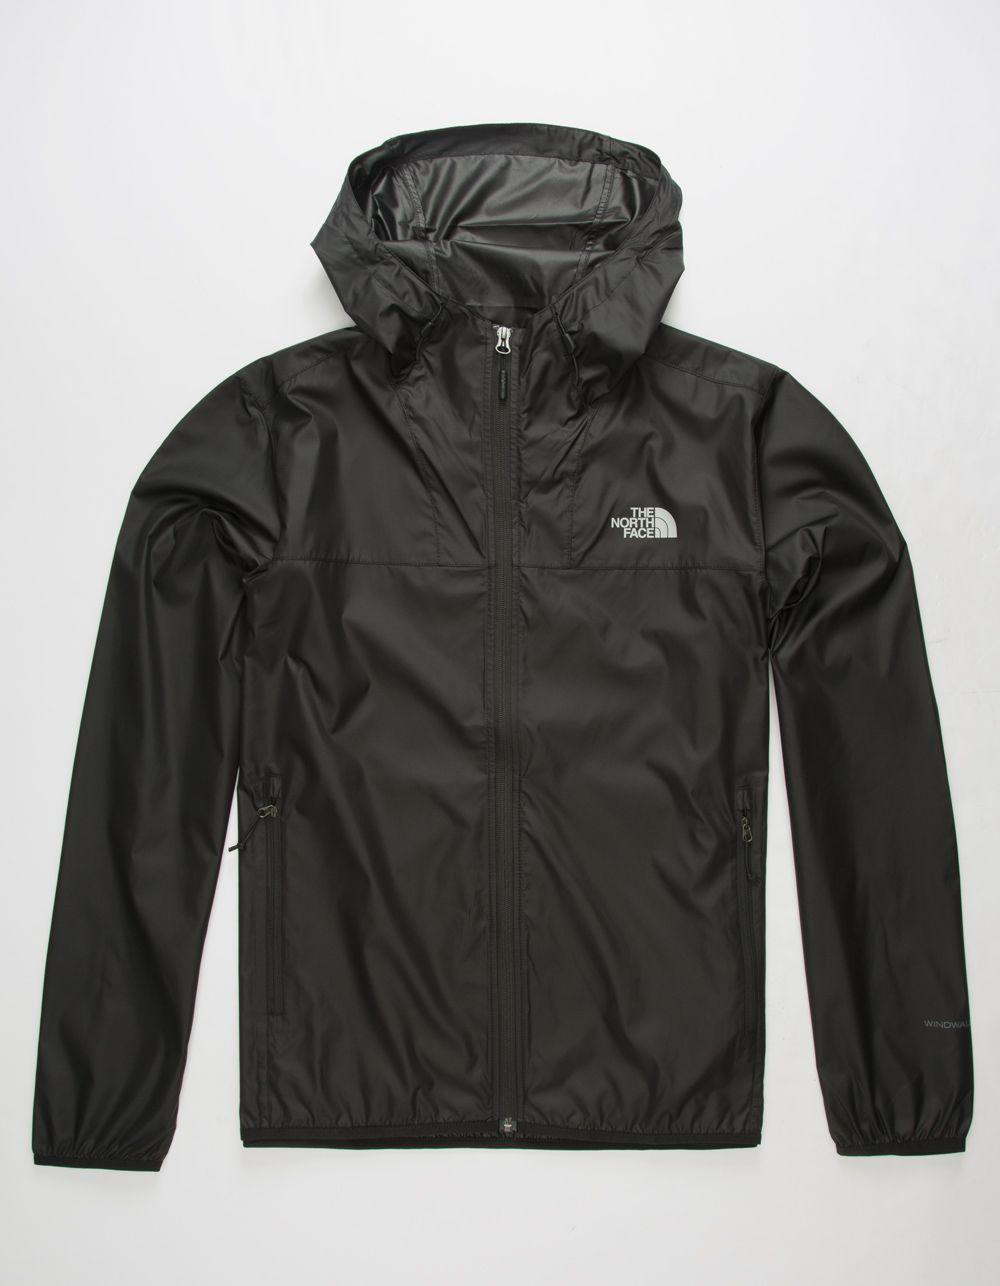 The North Face Cyclone 2 Black Mens Windbreaker Jacket Black 291103100 Black Windbreaker Nike Windbreaker Jacket Windbreaker Jacket [ 1286 x 1000 Pixel ]